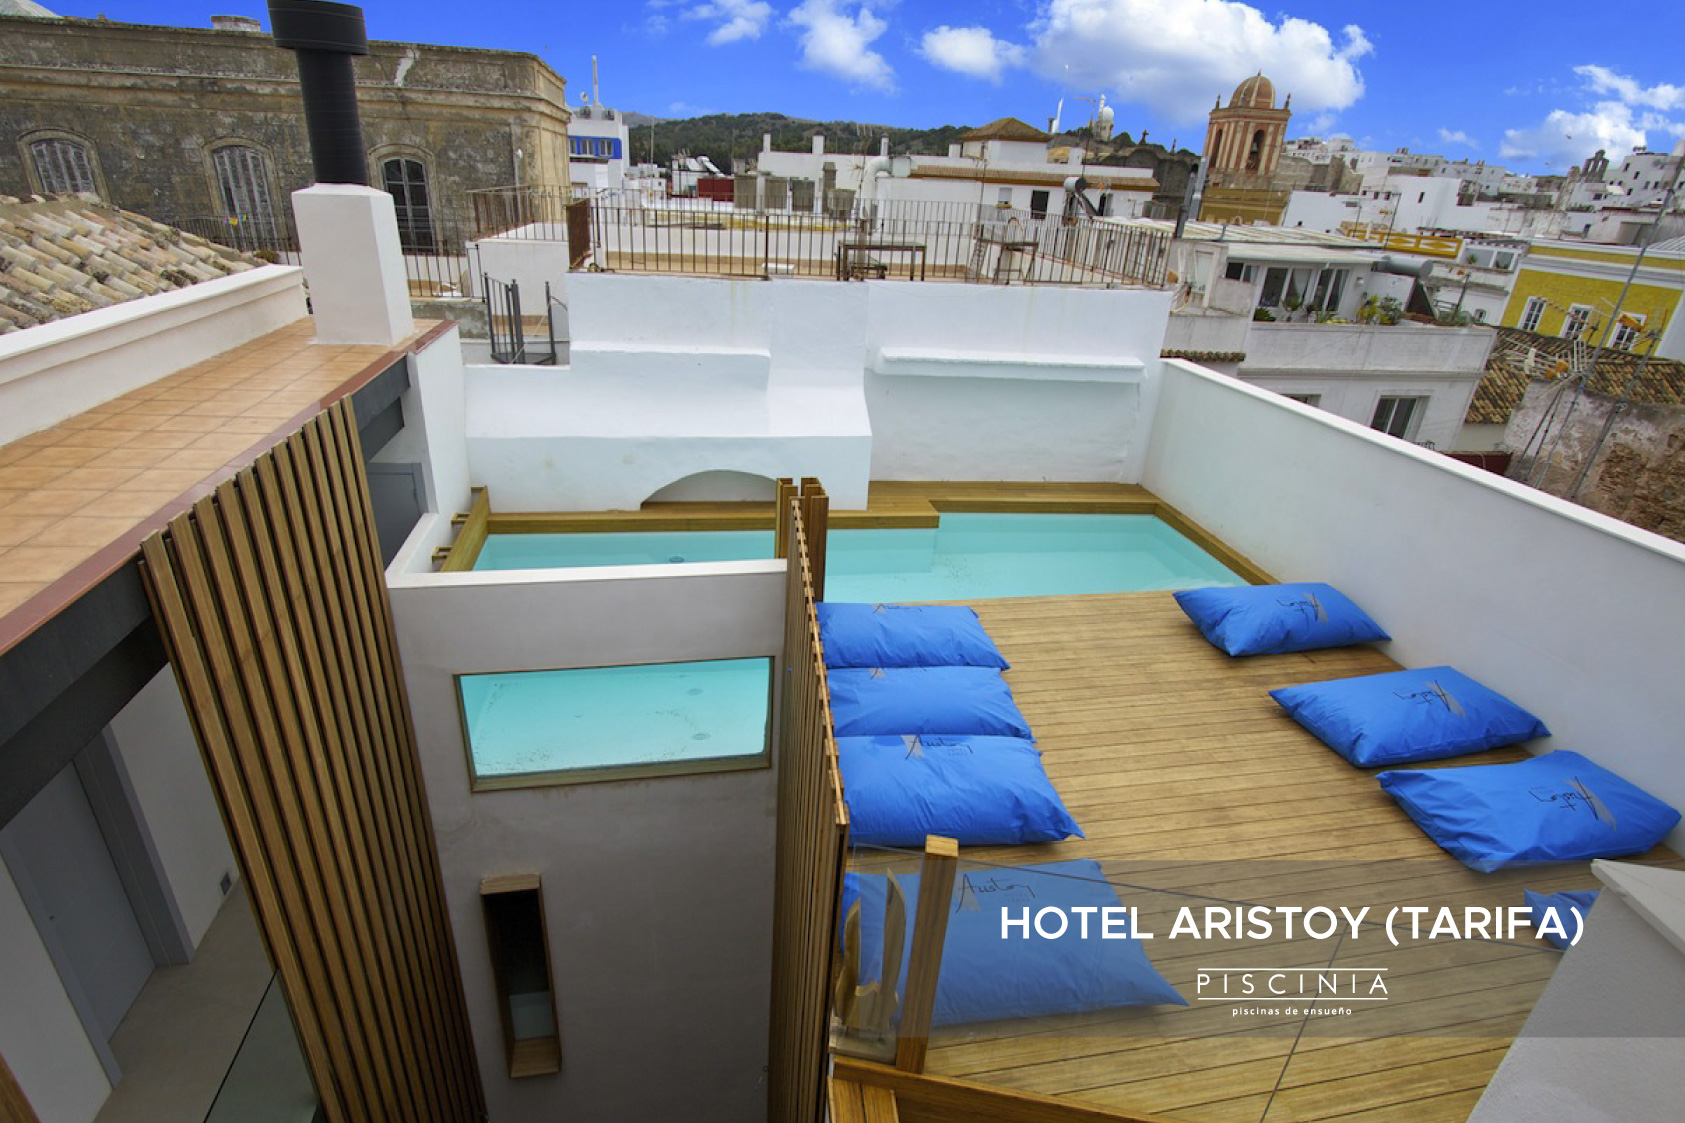 hotelaristoytarifa12